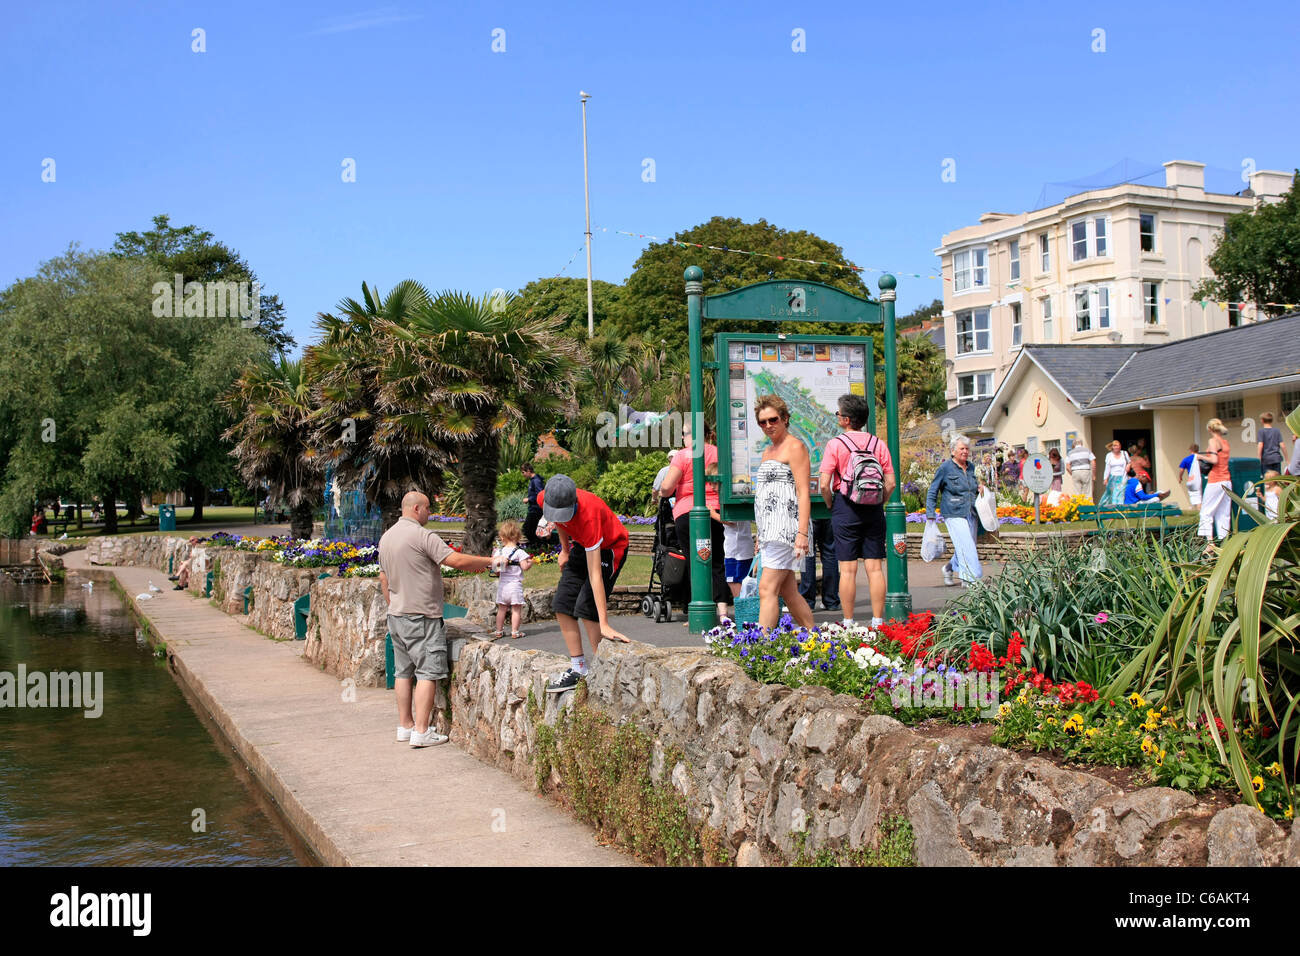 The Lawn, a family gardens in Dawlish Devon - Stock Image